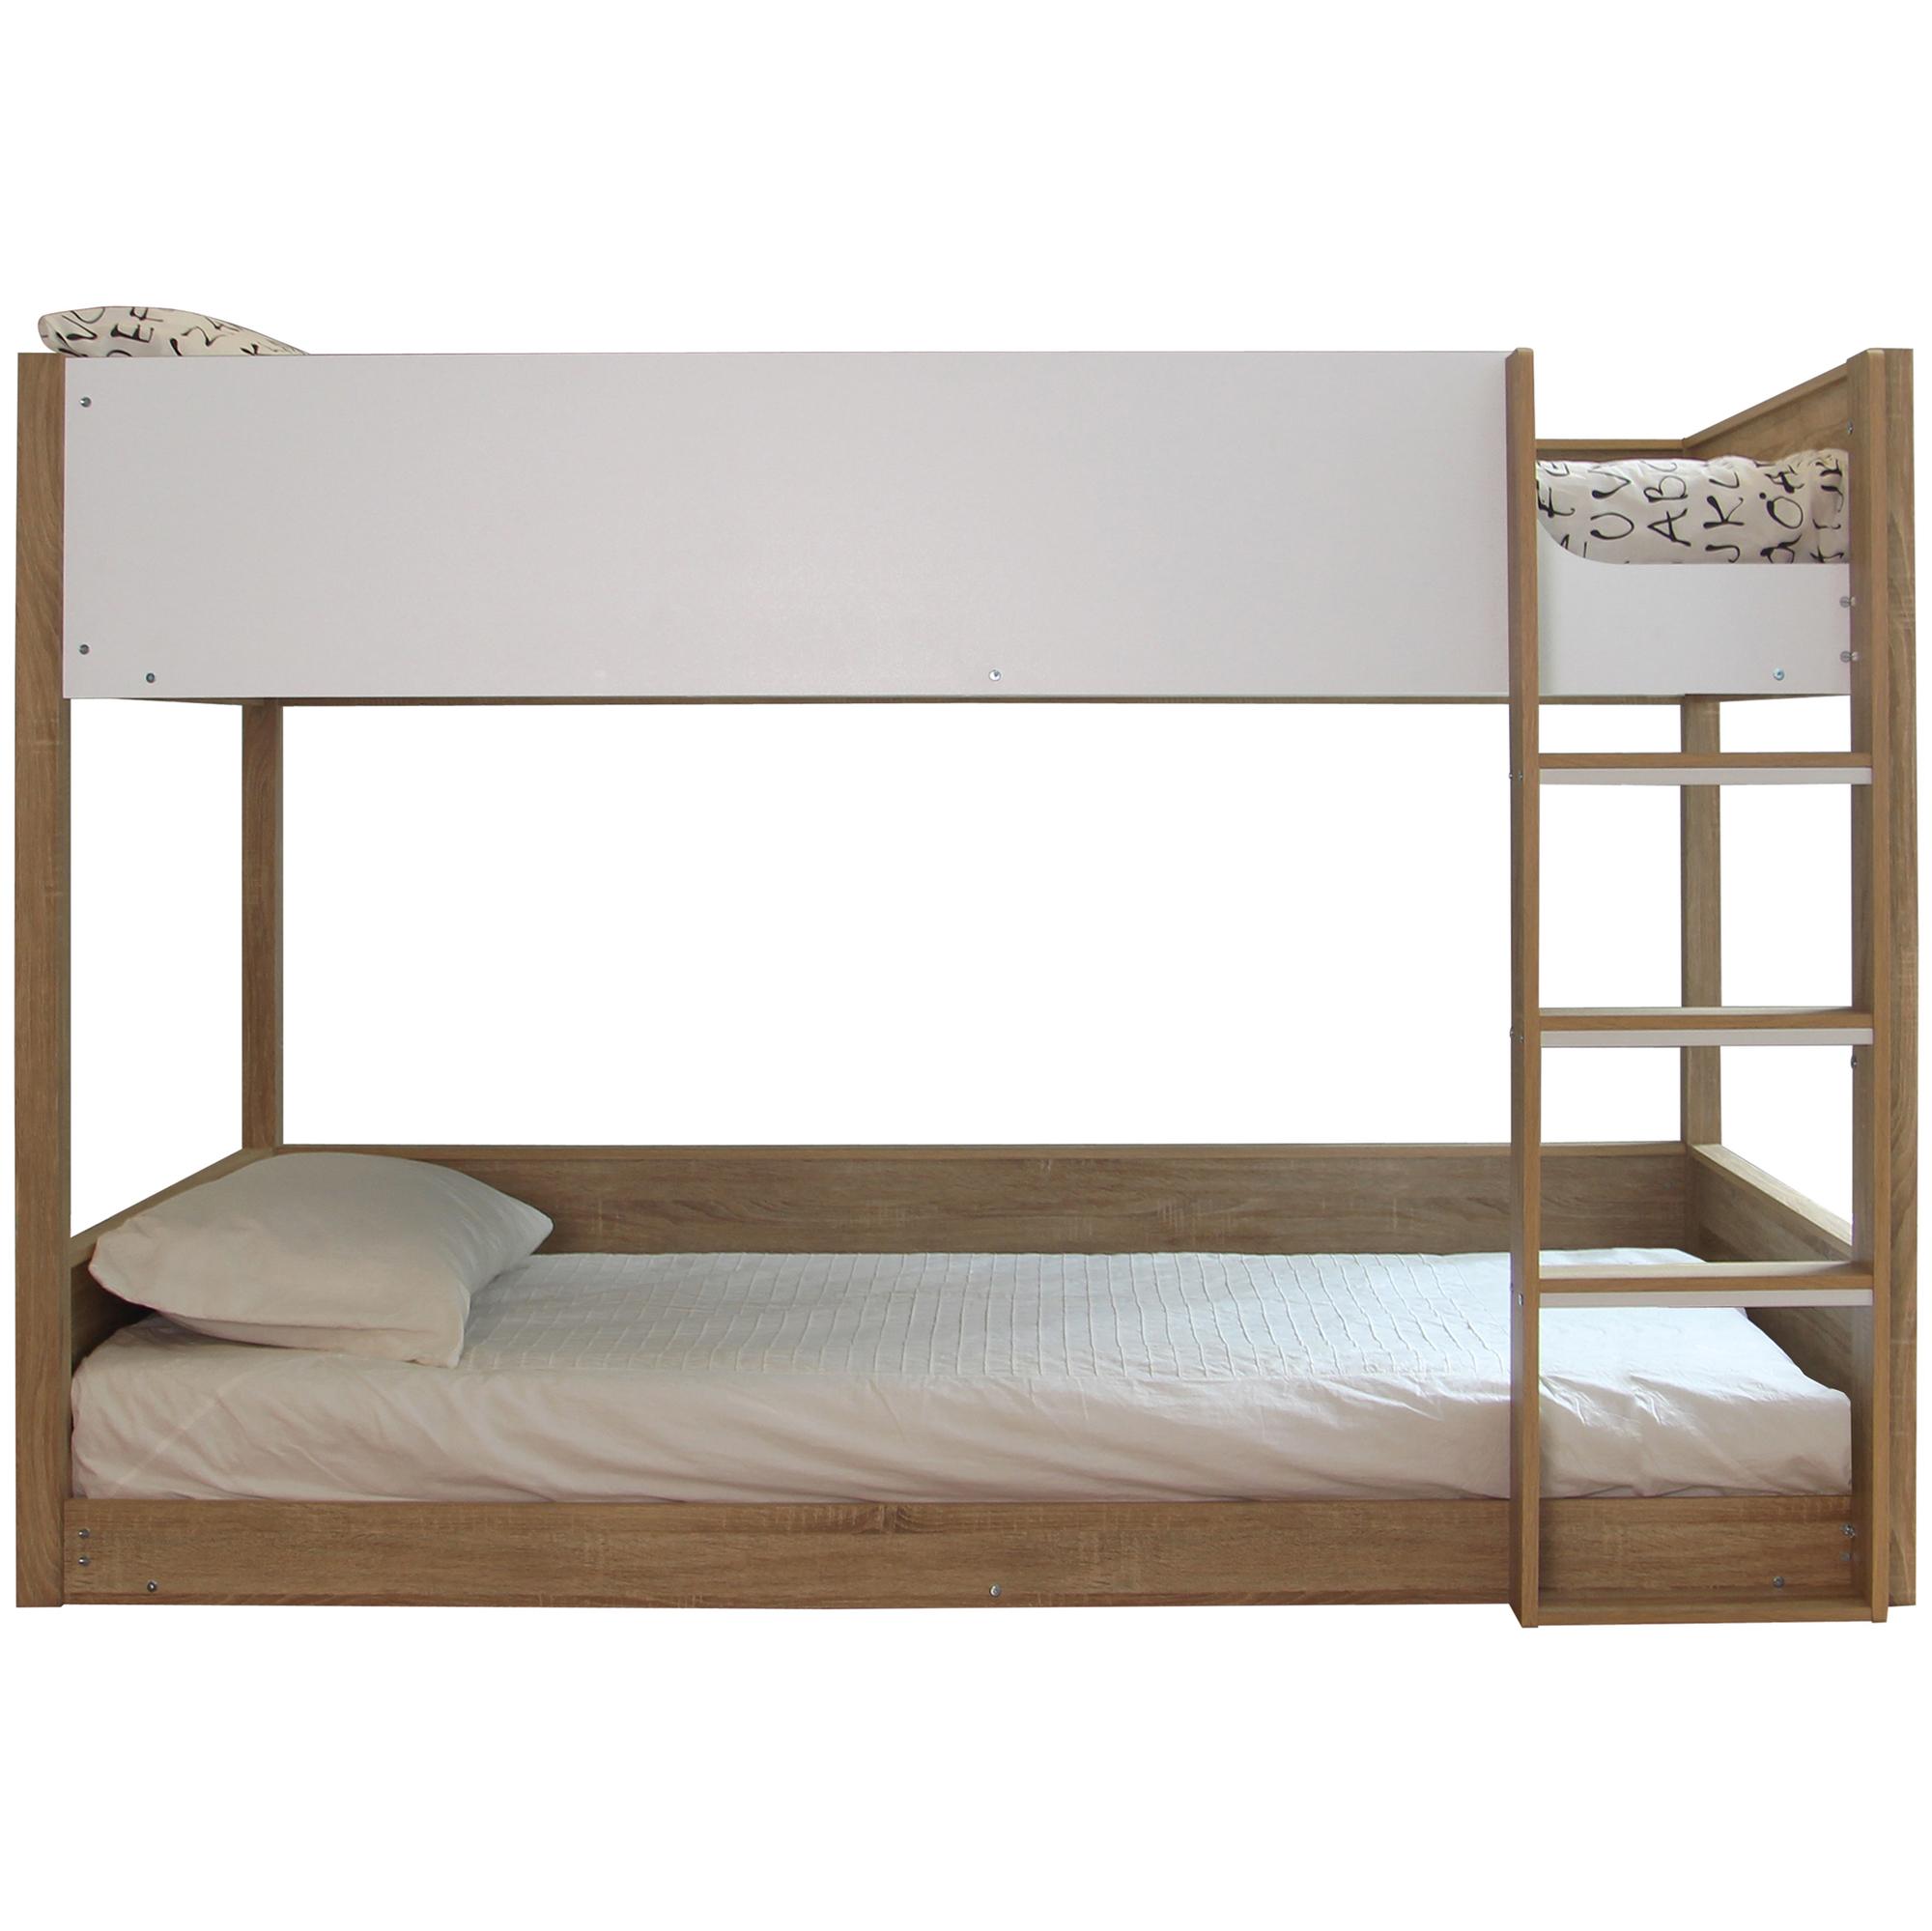 uk availability 9ce2a 8437f Sonoma Oak Gisborne King Single Bunk Bed